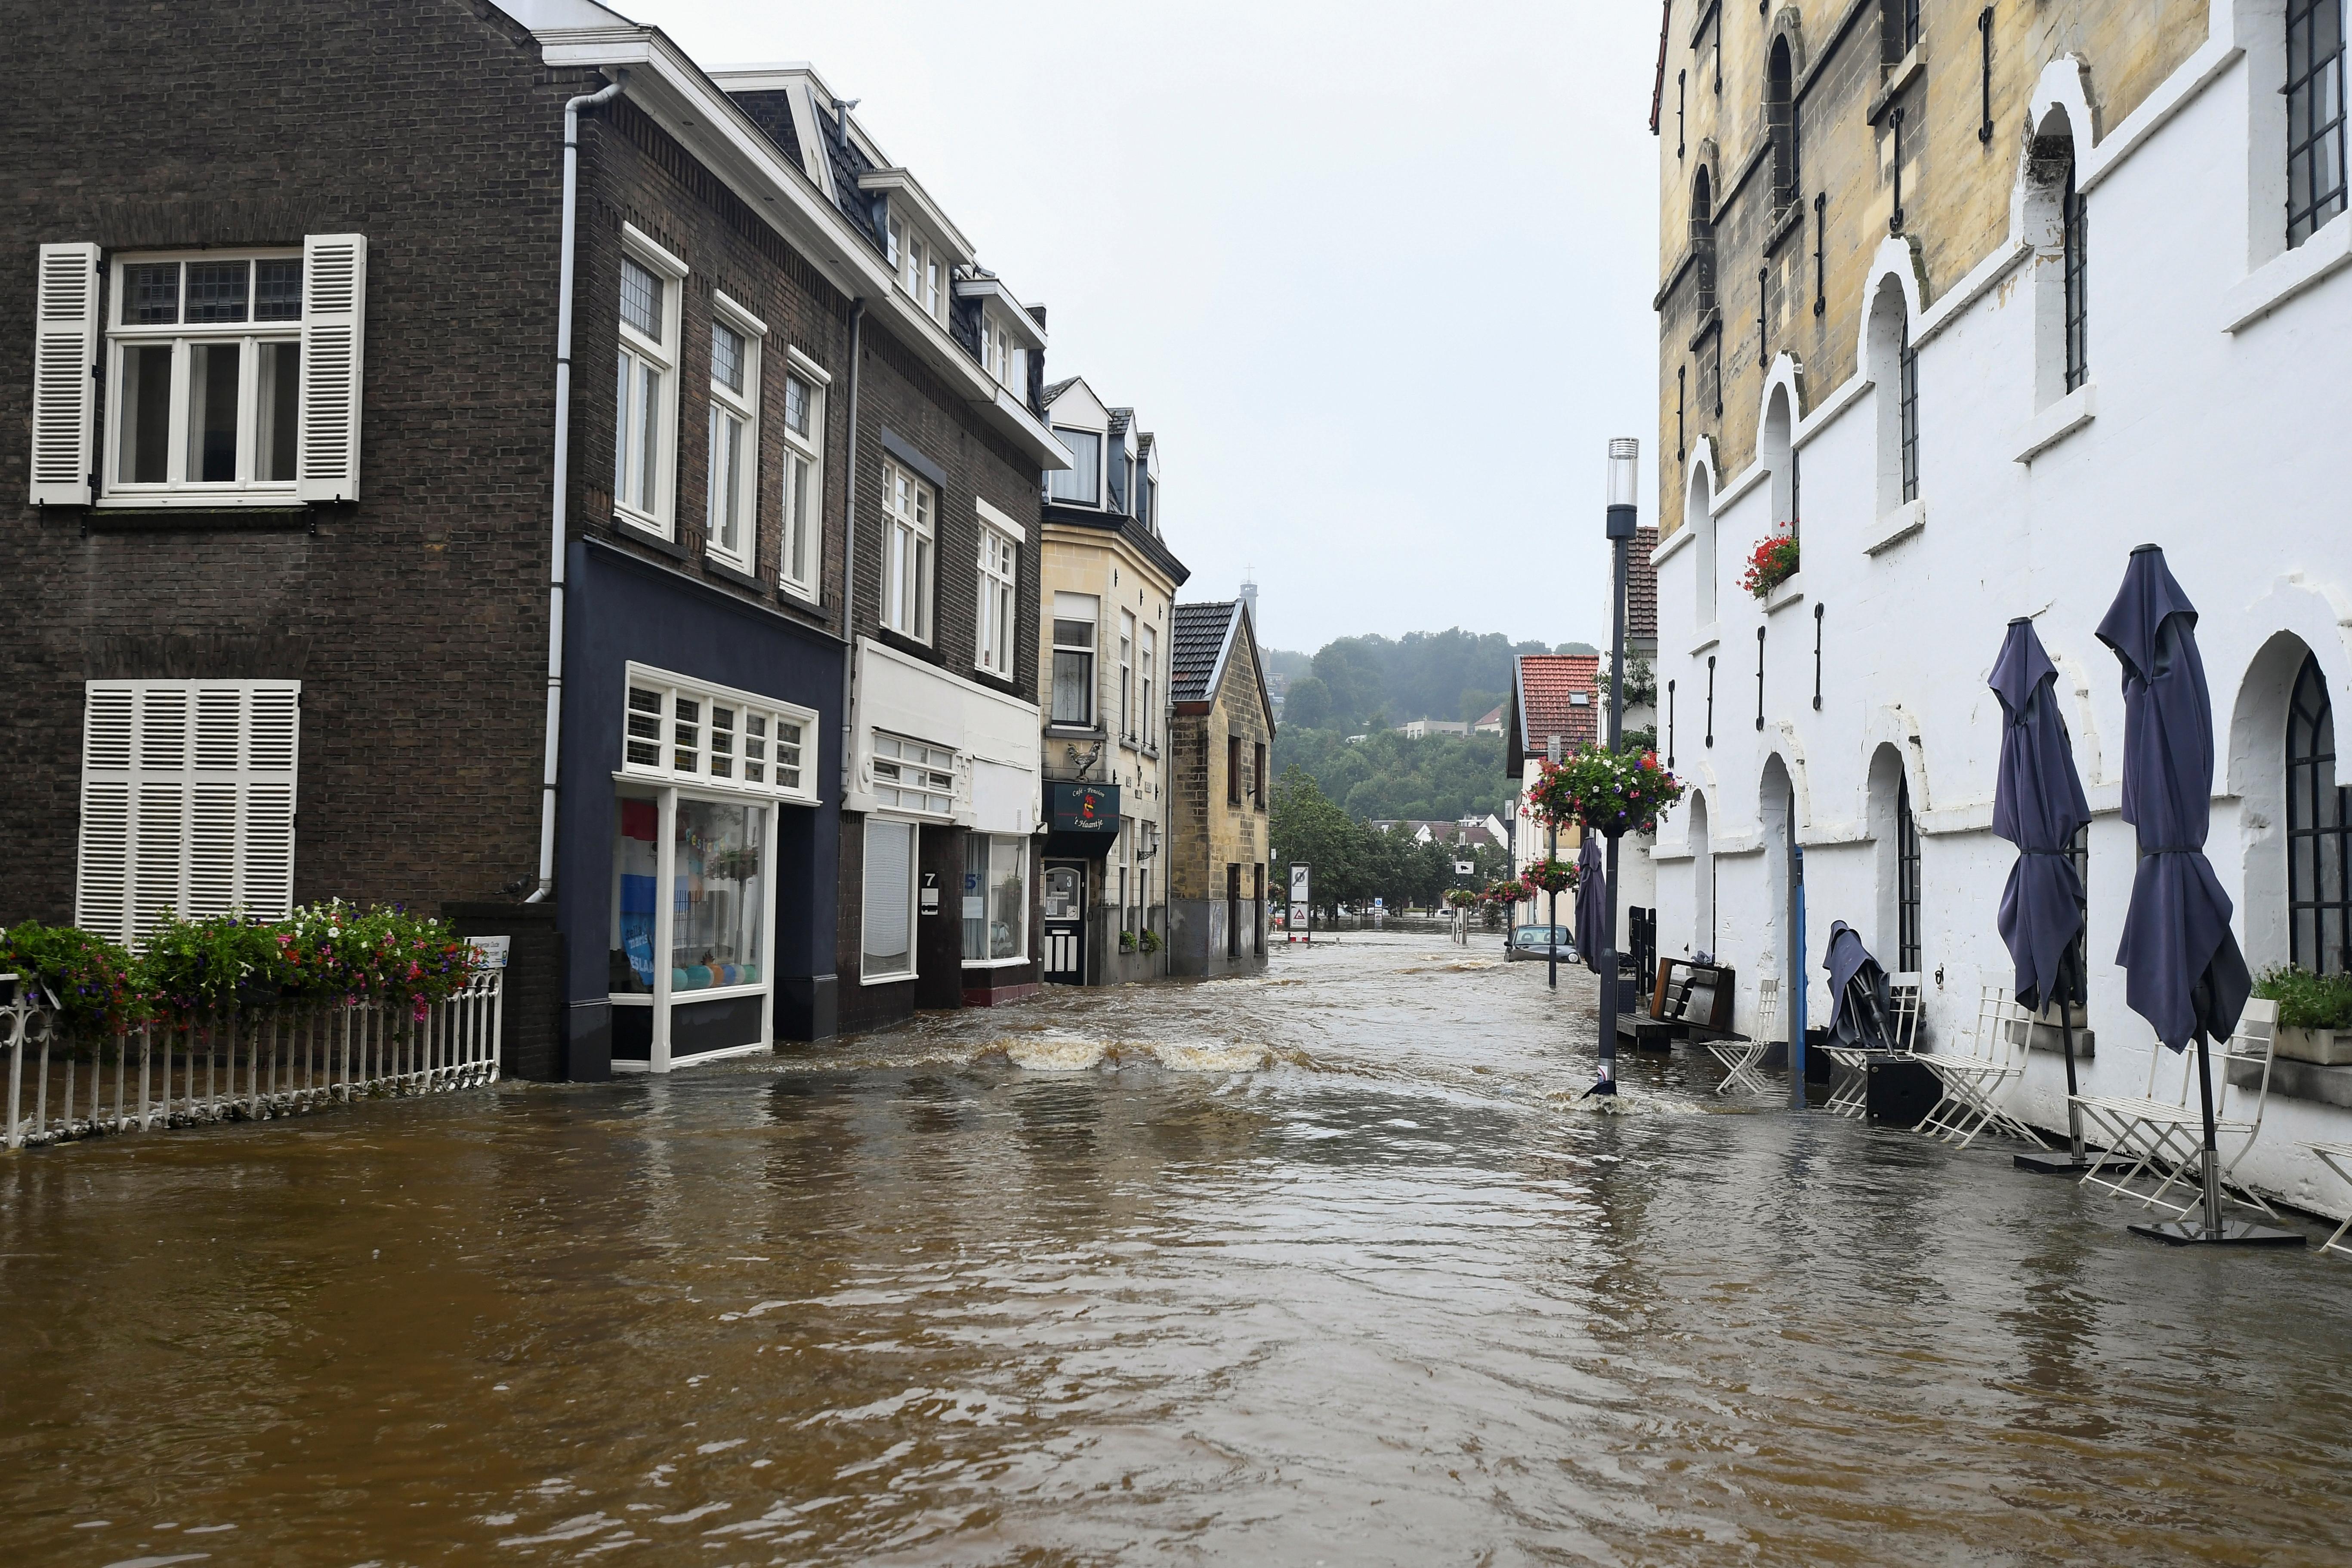 A flooded street is seen following heavy rainfalls in Valkenburg, Netherlands, July 15, 2021. REUTERS/Piroschka Van De Wouw